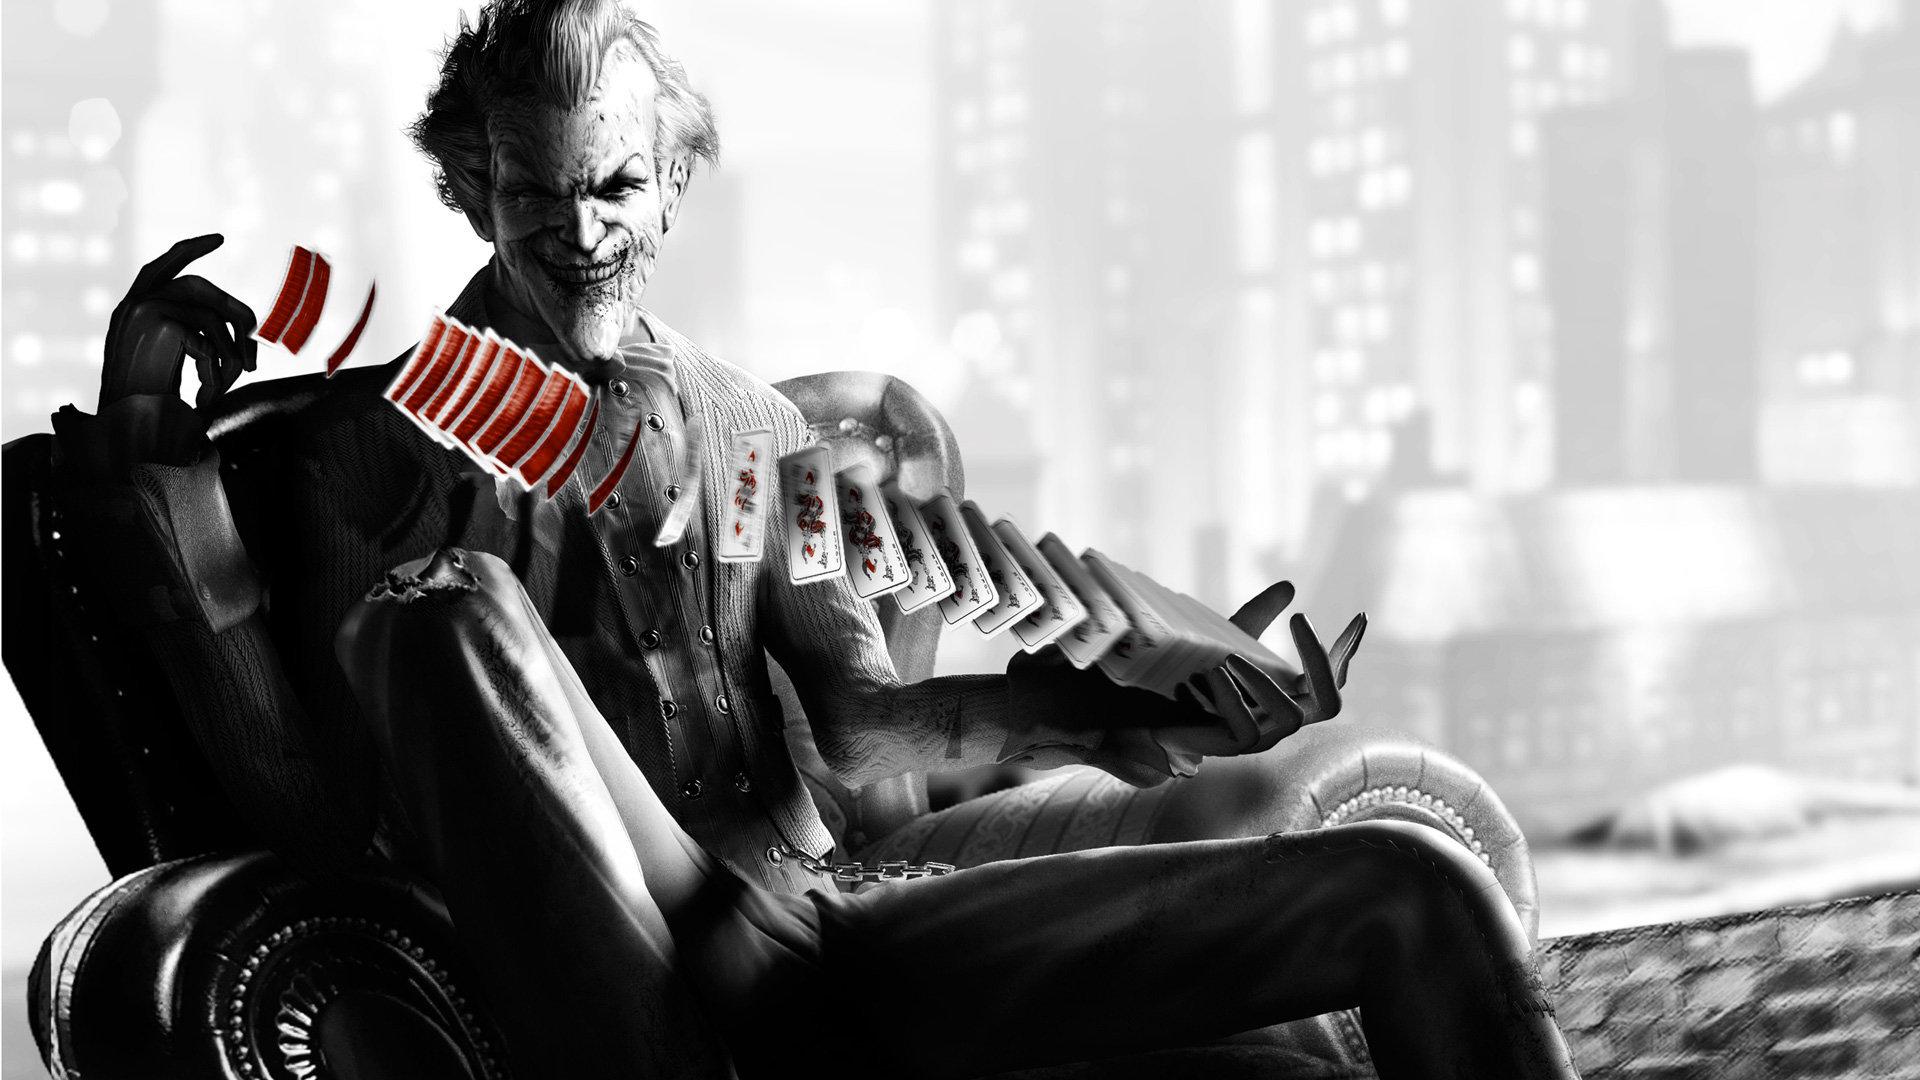 Hd wallpaper of joker - Batman Arkham City Joker Wallpaper 1920 1080 23054 Hd Wallpaper Res